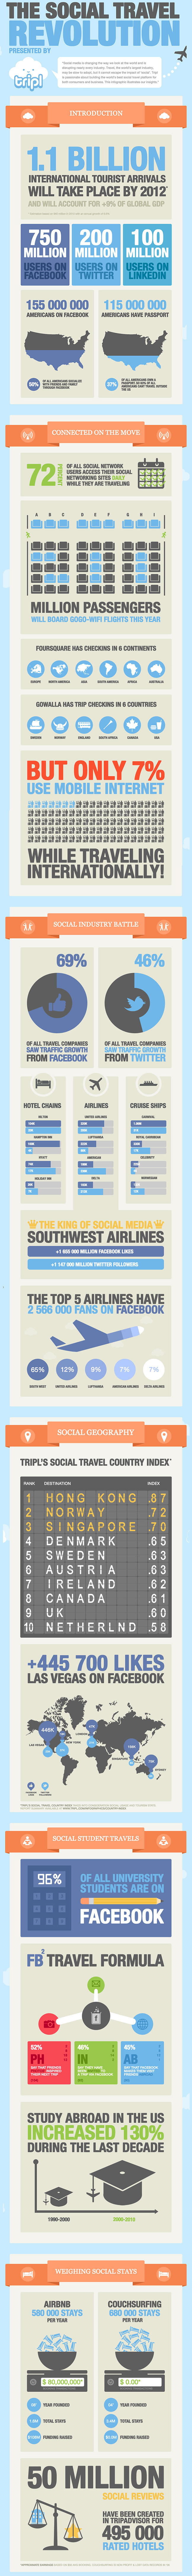 Infographic: The Social Travel Revolution